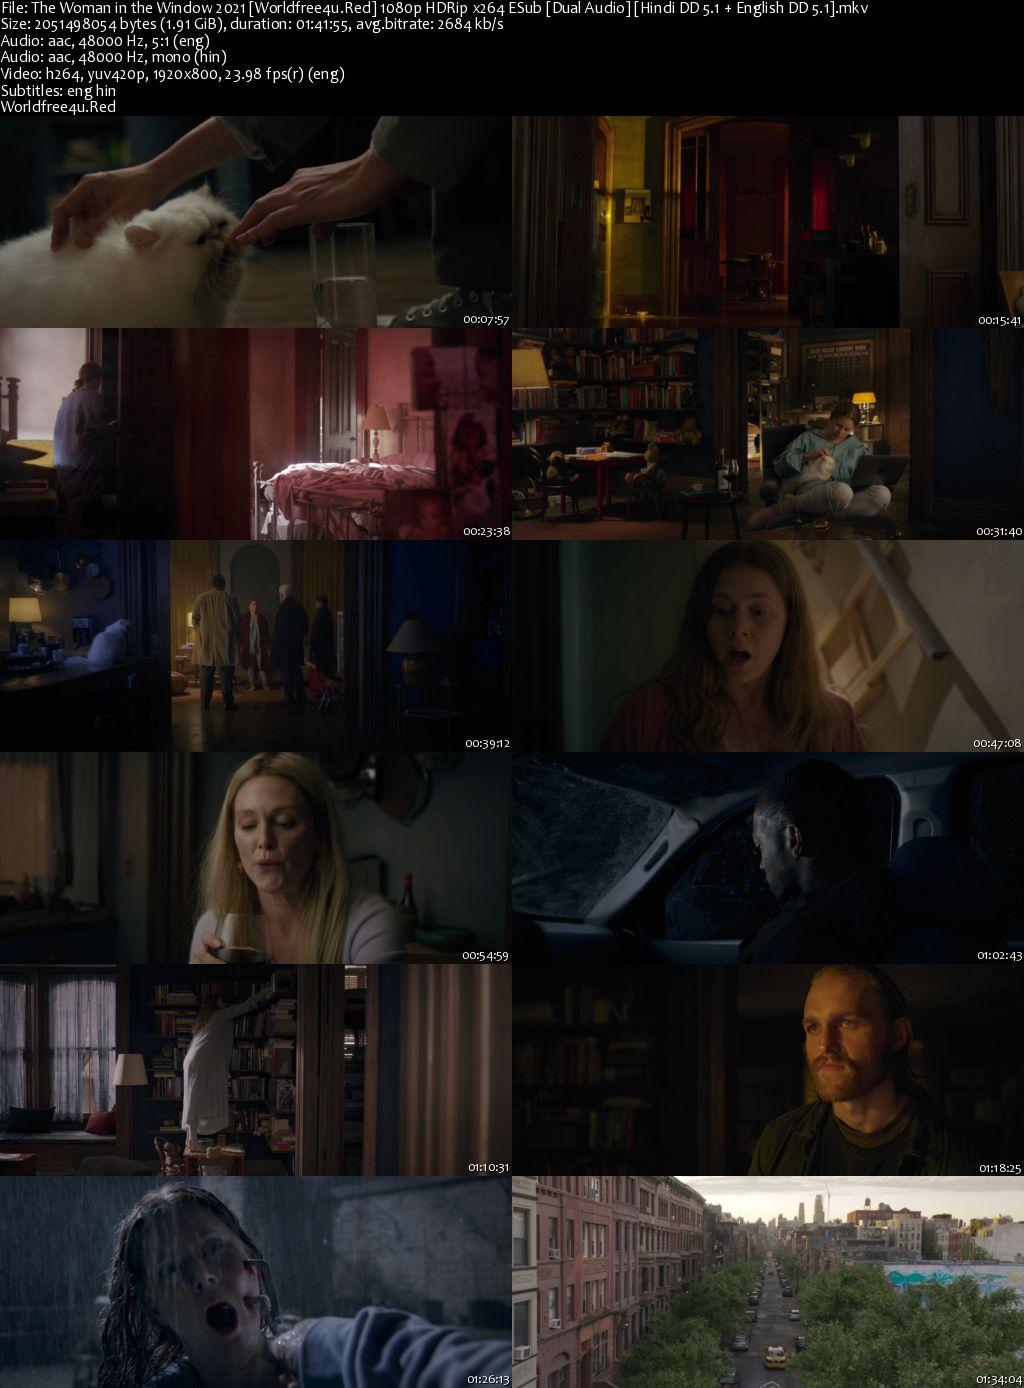 The Woman in the Window 2021 HDRip 1080p Dual Audio